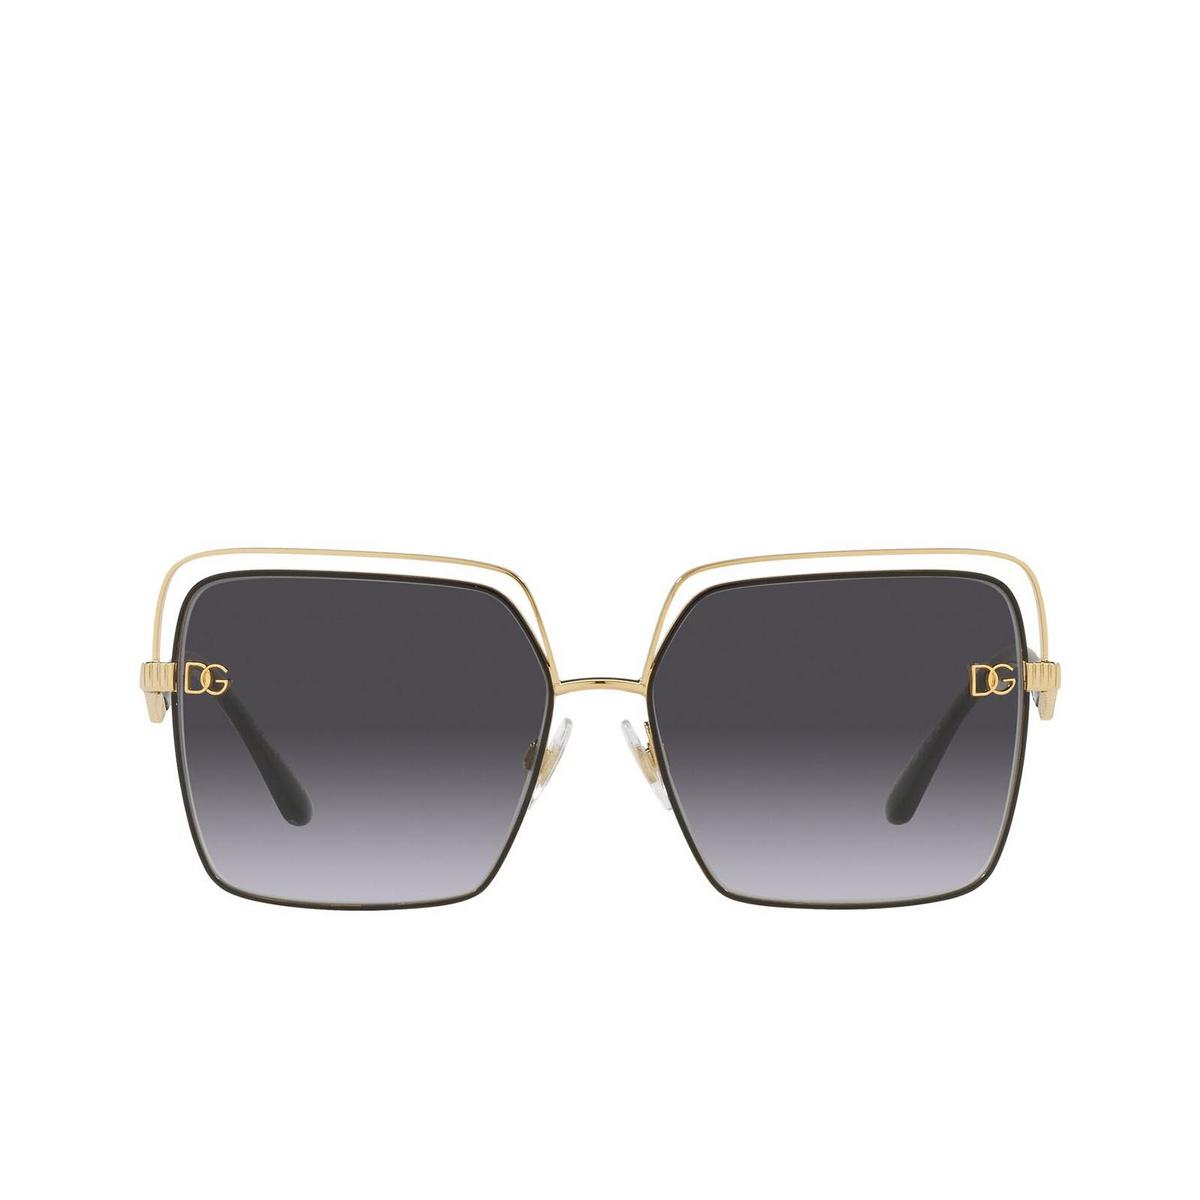 Dolce & Gabbana® Square Sunglasses: DG2268 color Gold/black 13348G.